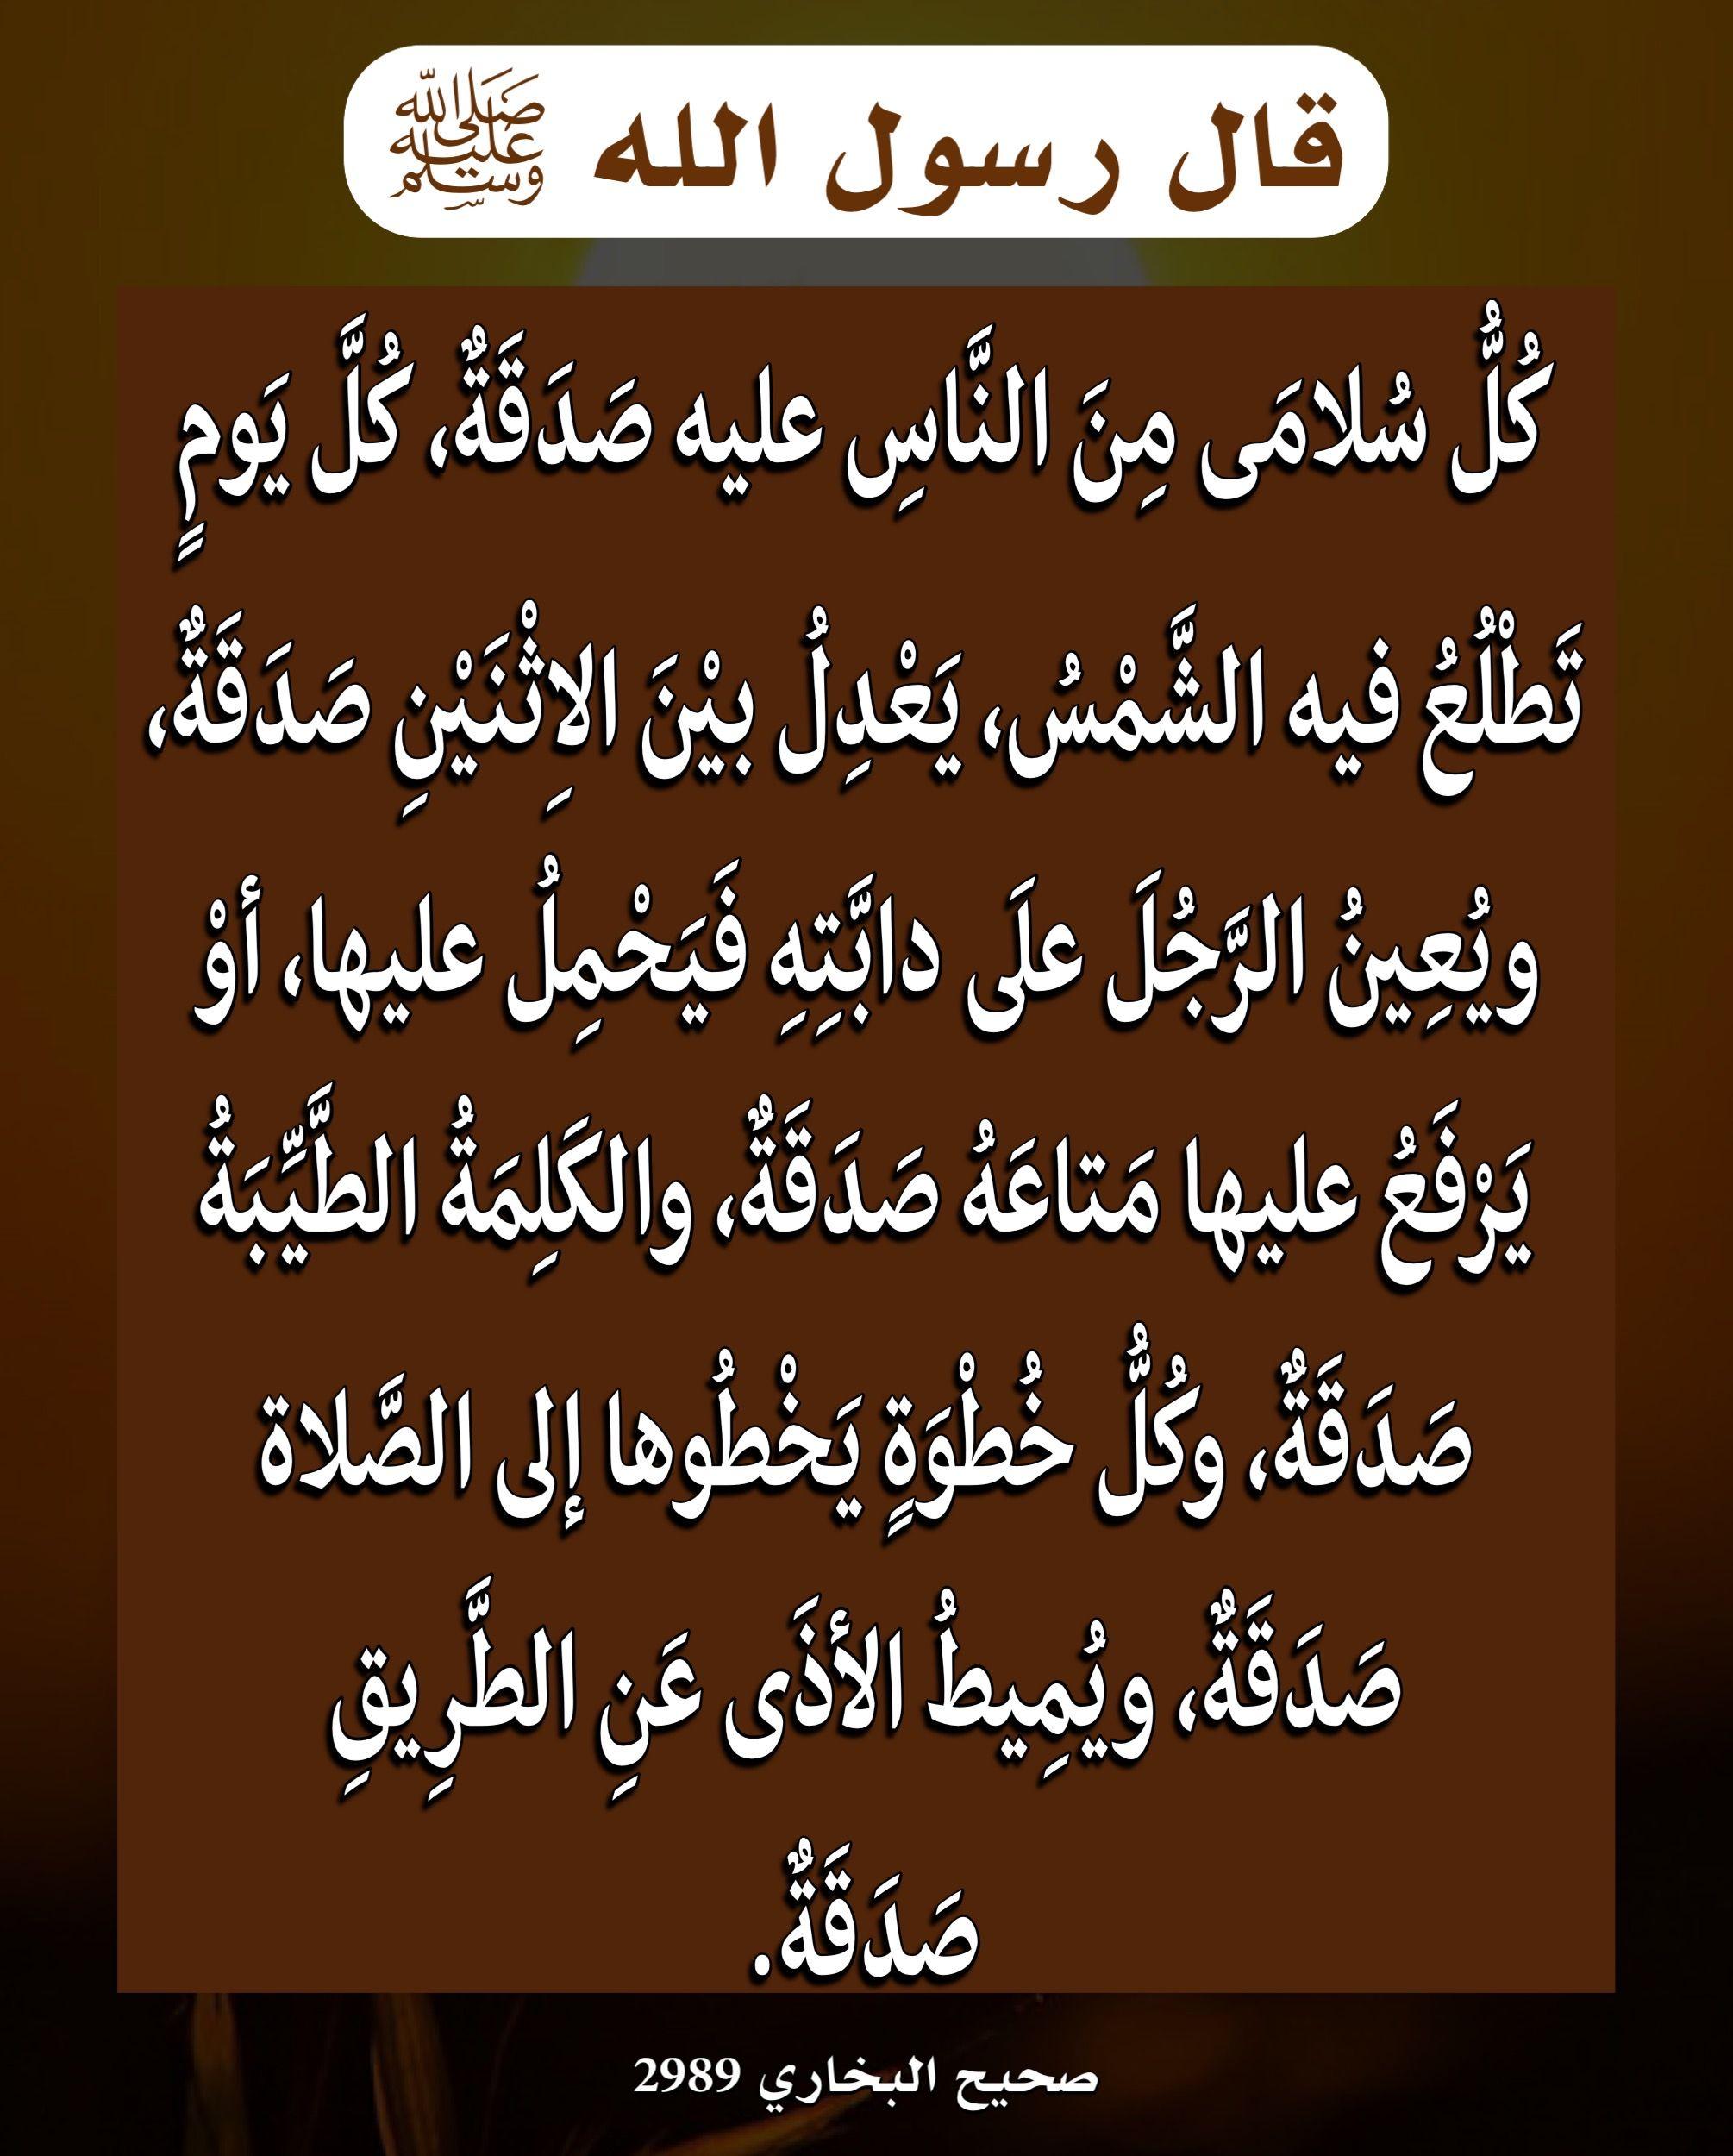 Pin By الأثر الجميل On أحاديث نبوية Arabic Quotes Words Quotes